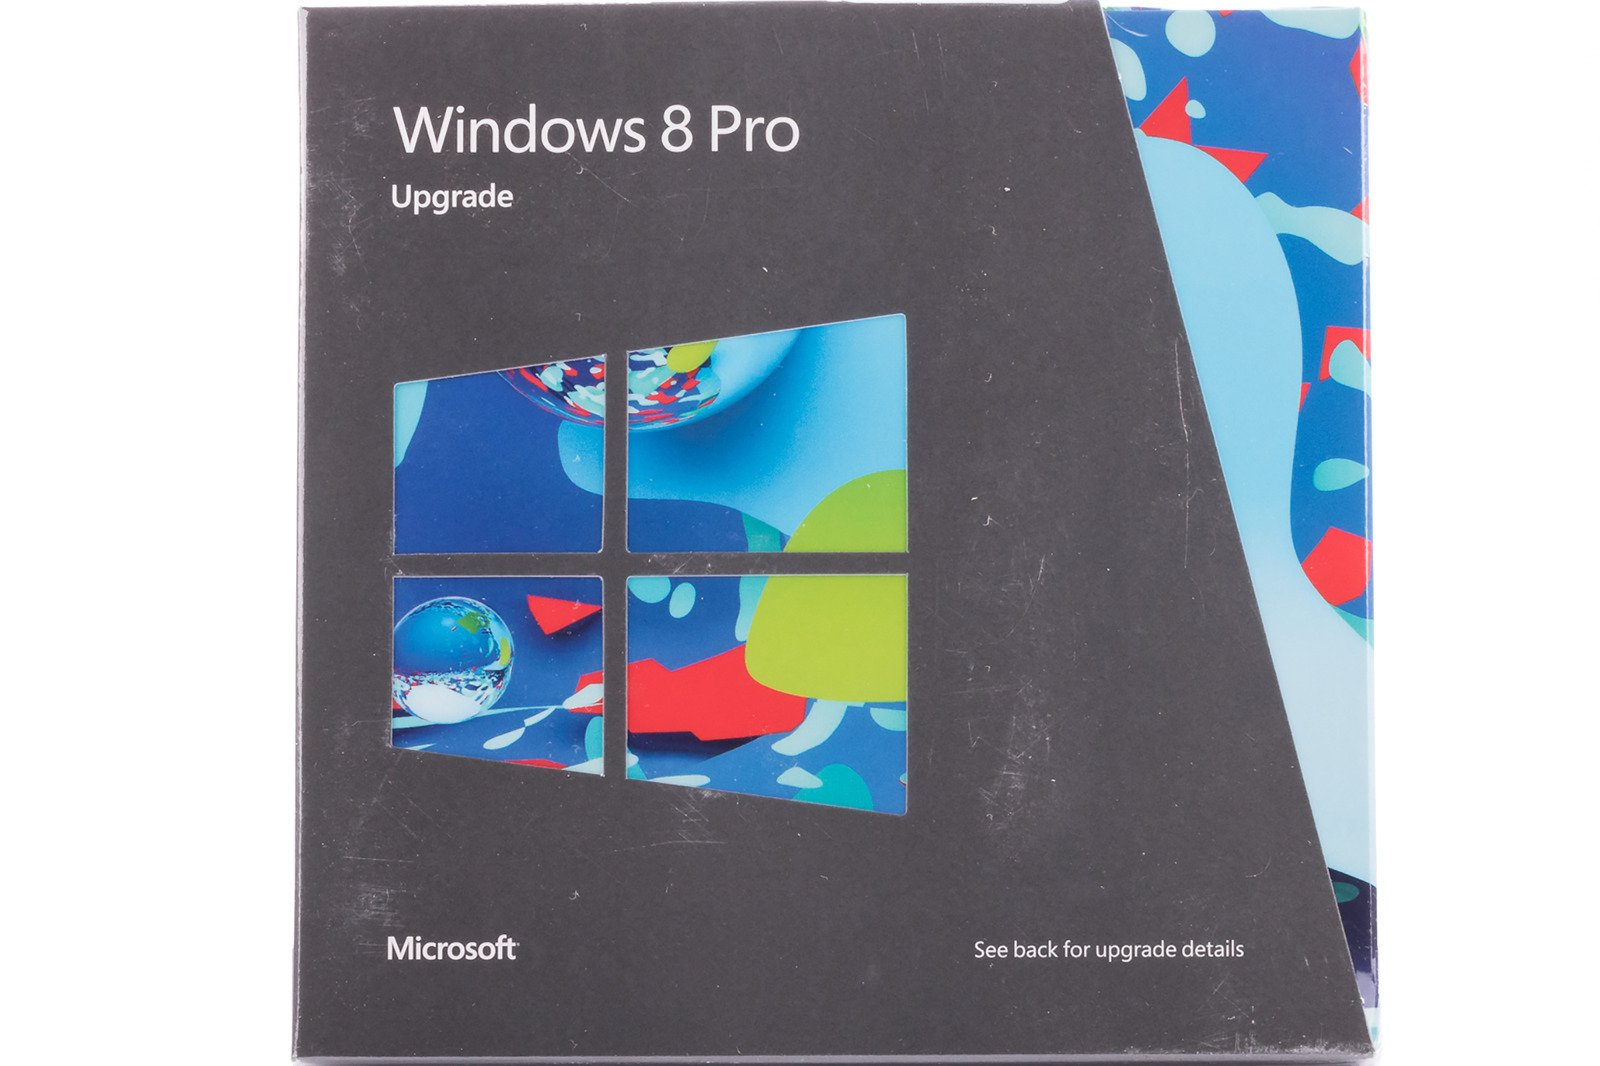 New Windows Professional 8 Upgrade for PC 3UR-00007 DVD 32/64bit Non EU/EFTA BOX